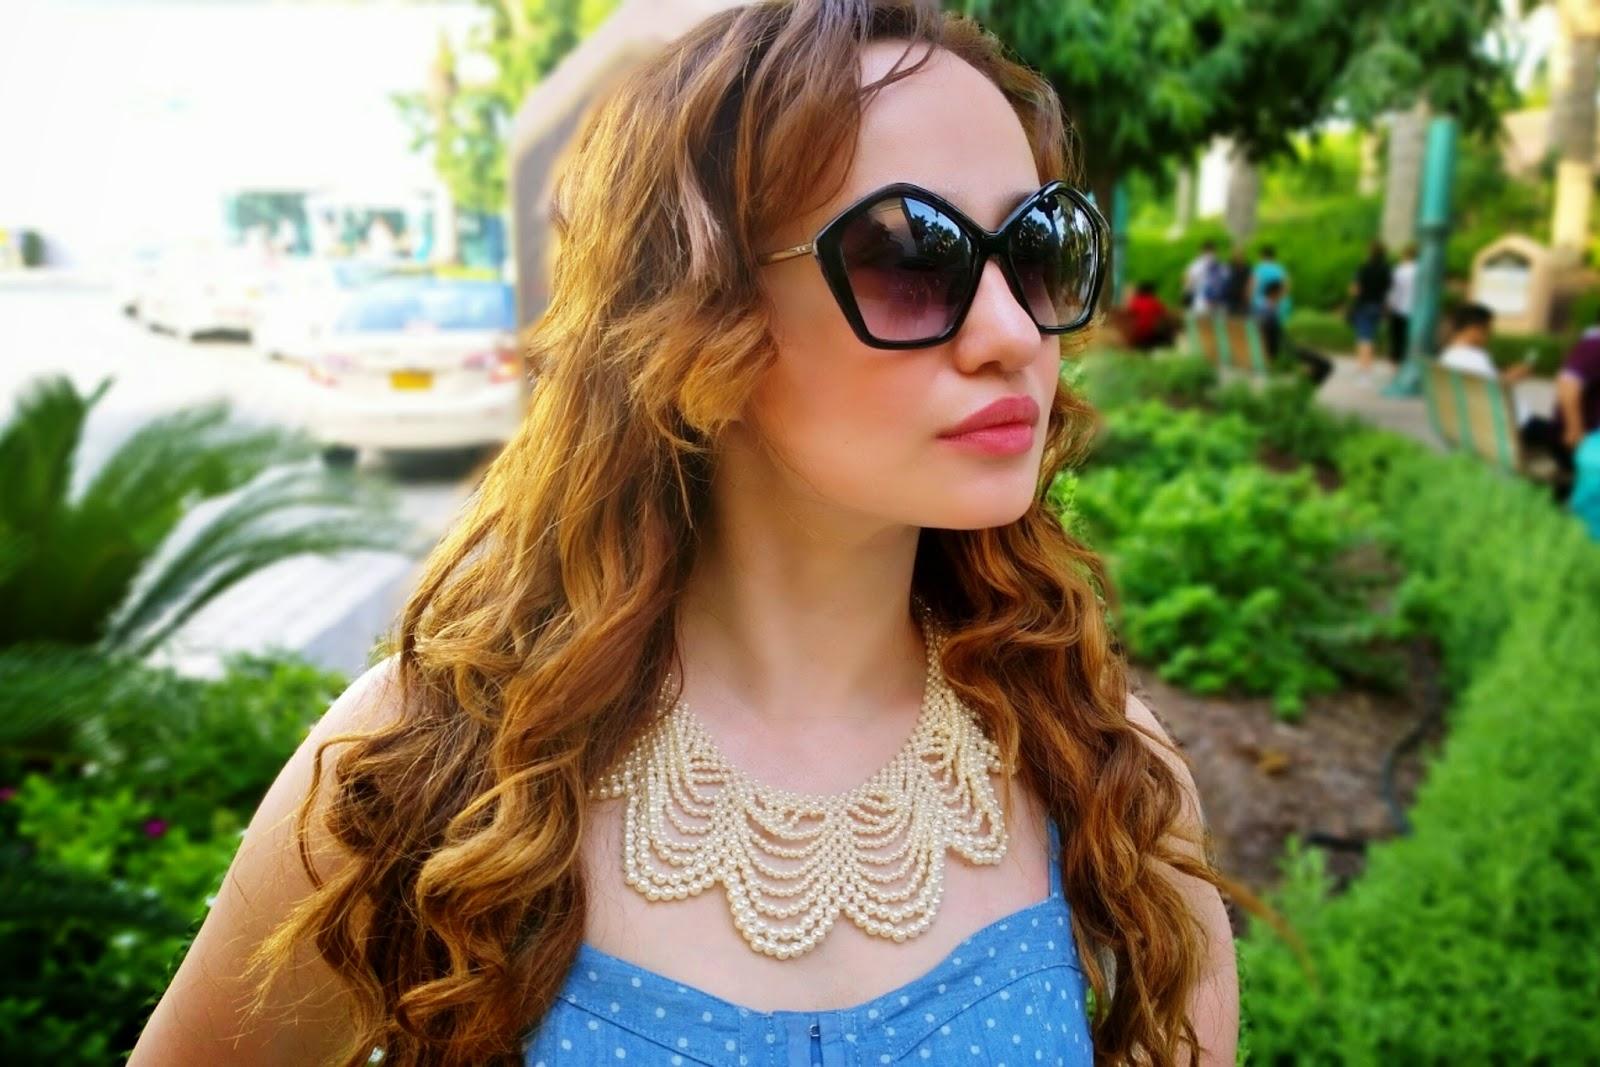 Pearl Necklace & Pentagon Retro Sunglasses